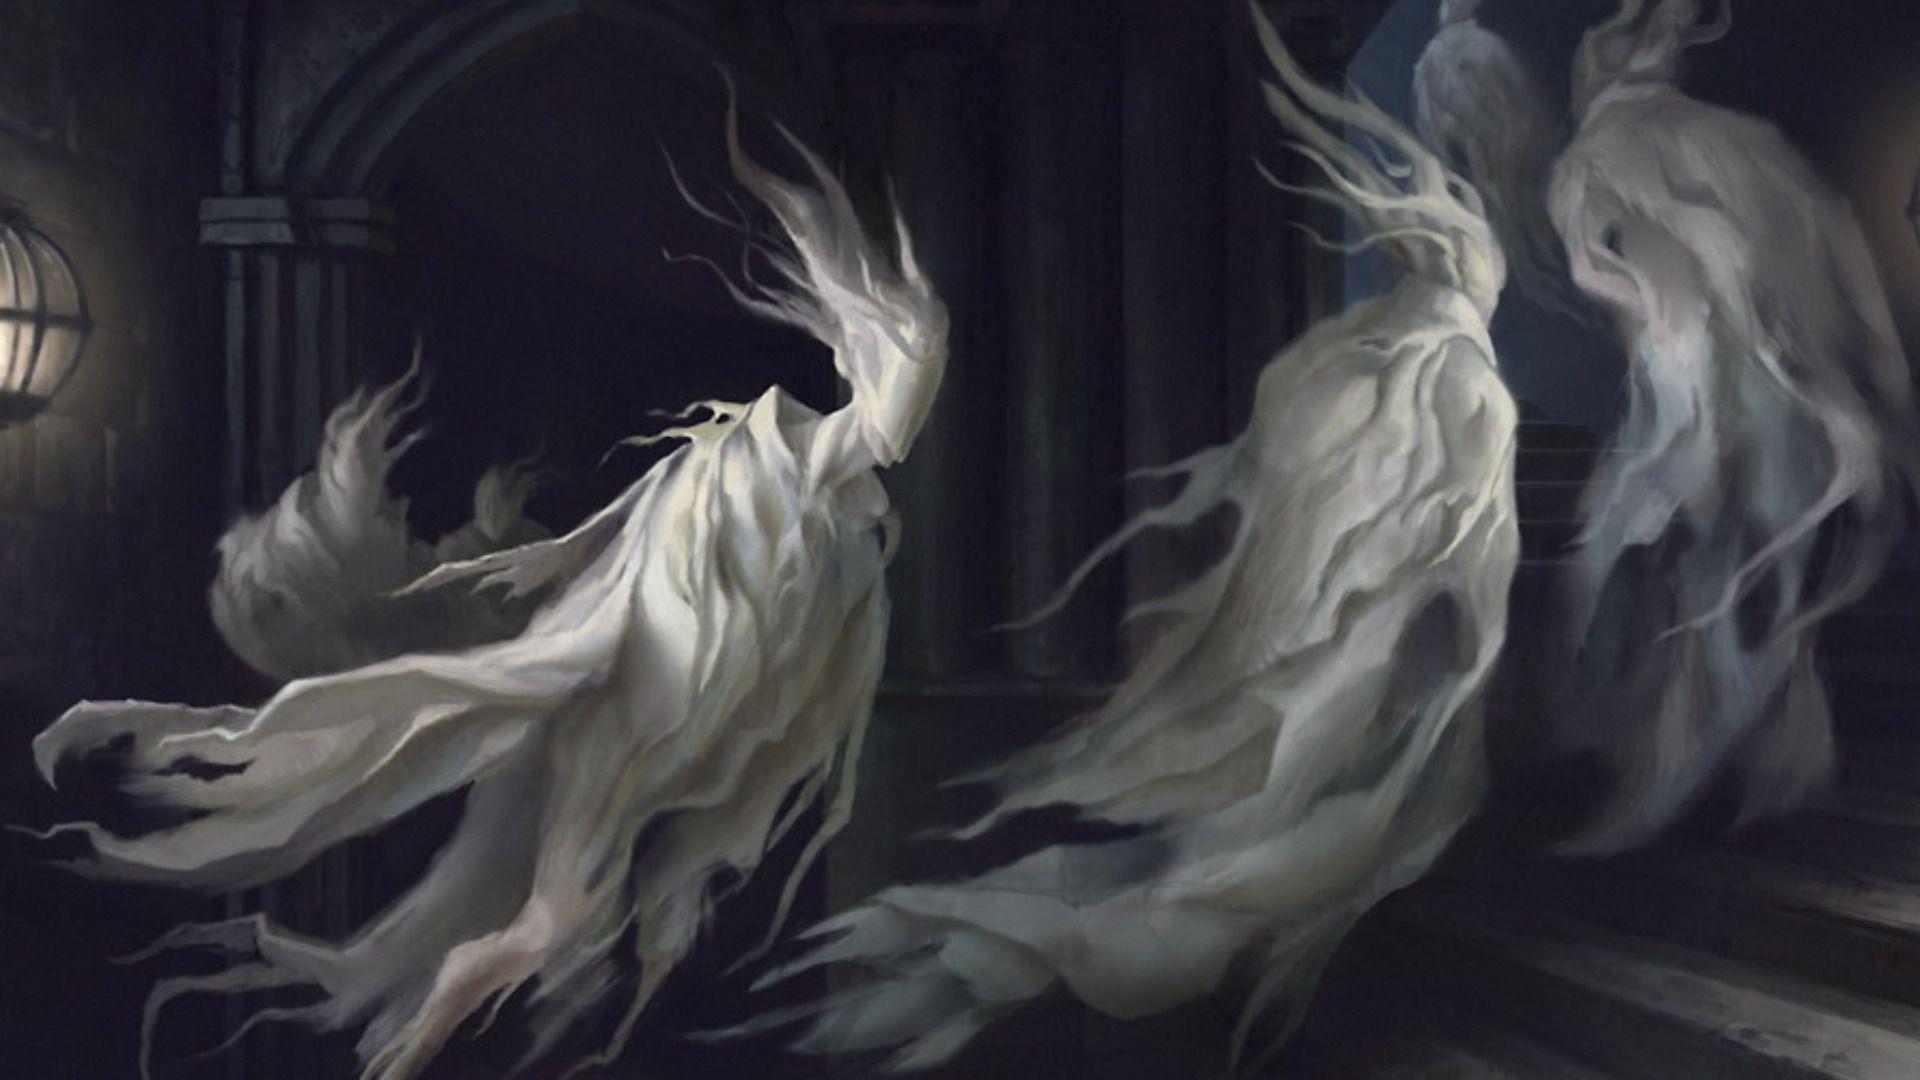 Dark horror ghost spooky creepy halloween art wallpaper ...